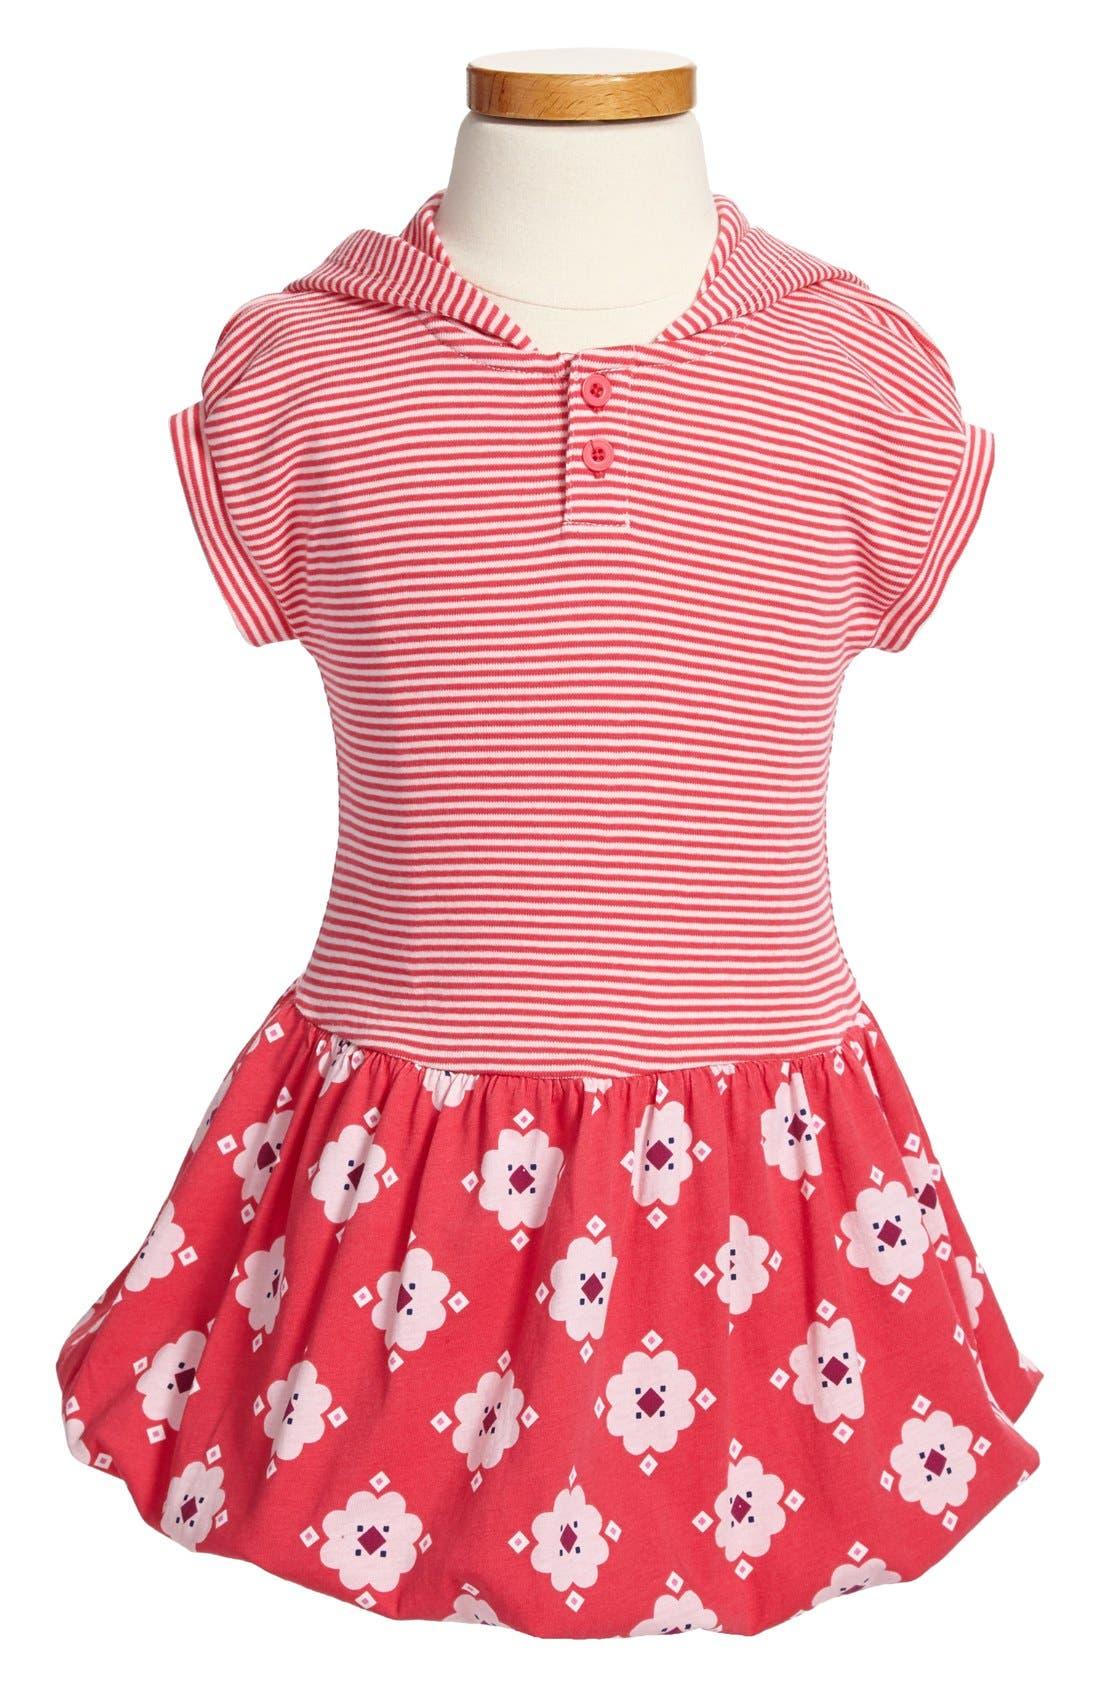 Main Image - Tea Collection 'Berber Floral' Bubble Dress (Little Girls & Big Girls)